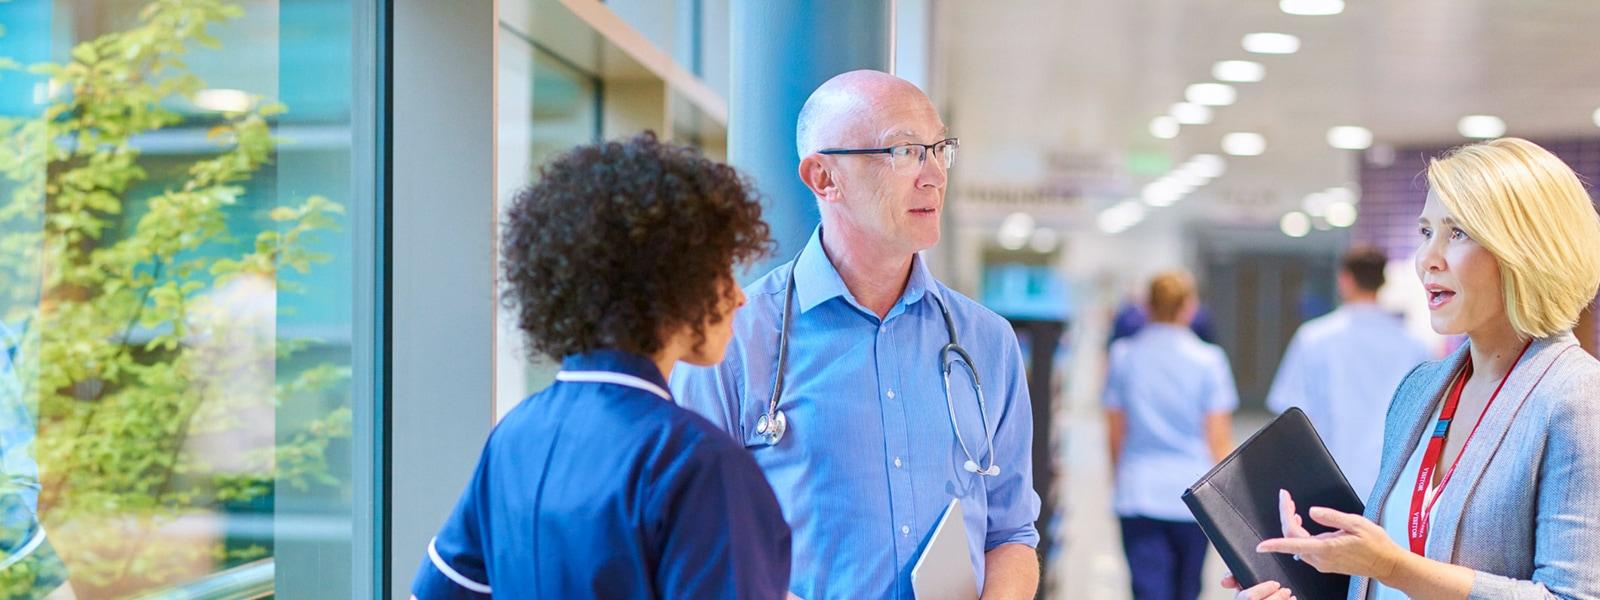 Medical professionals talking in hospital corridor